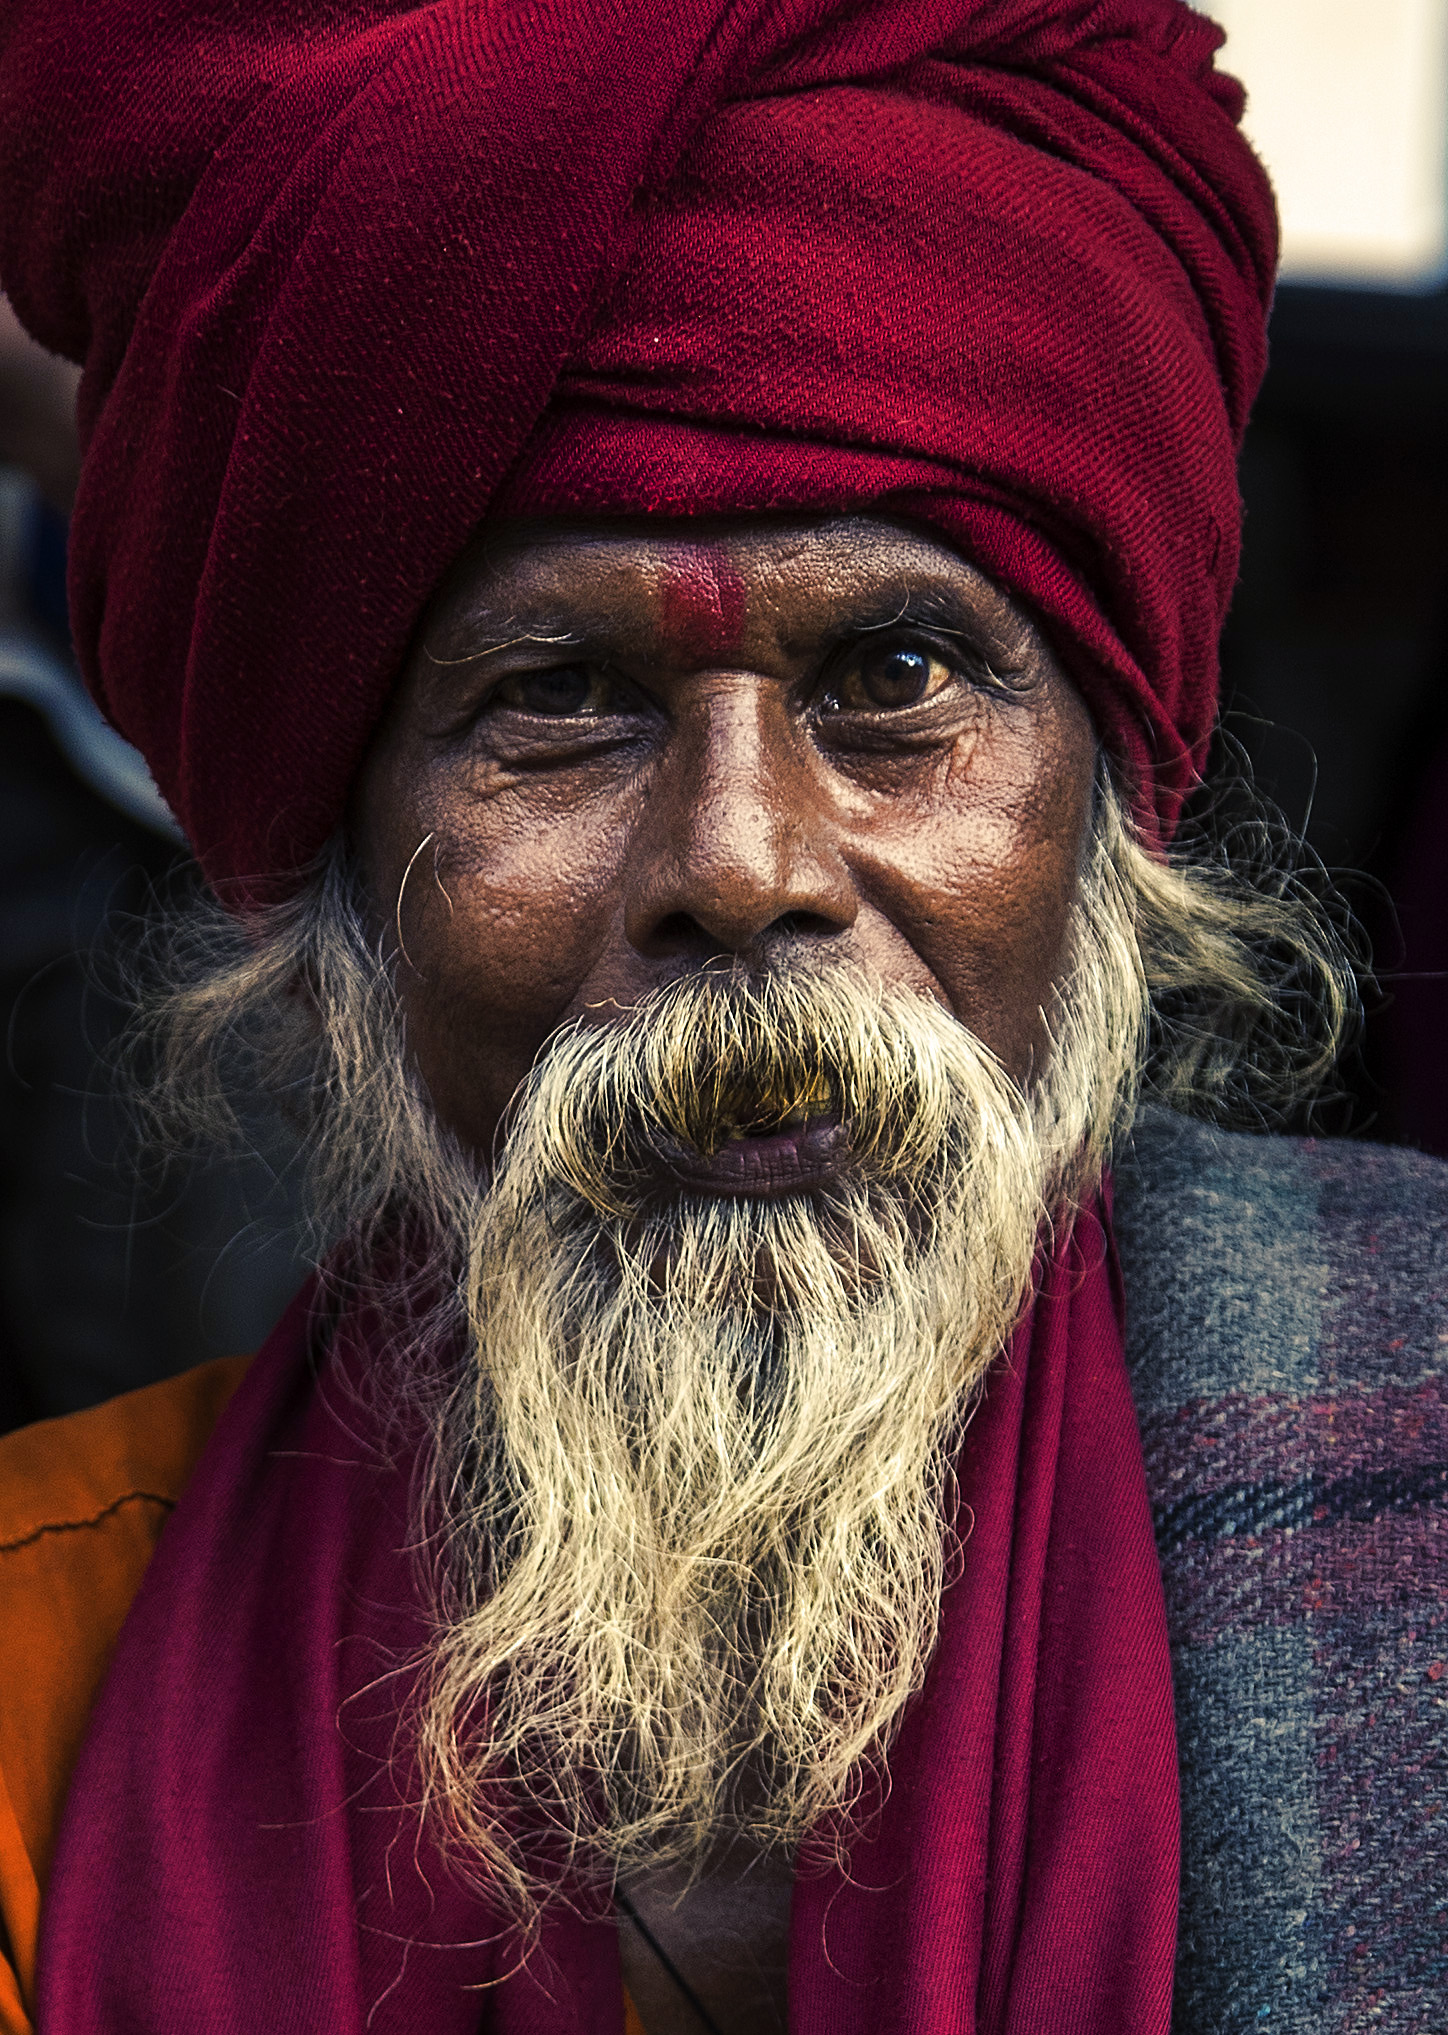 Simon+Needham+Humanitarian+Photography+Nepal+24.jpg